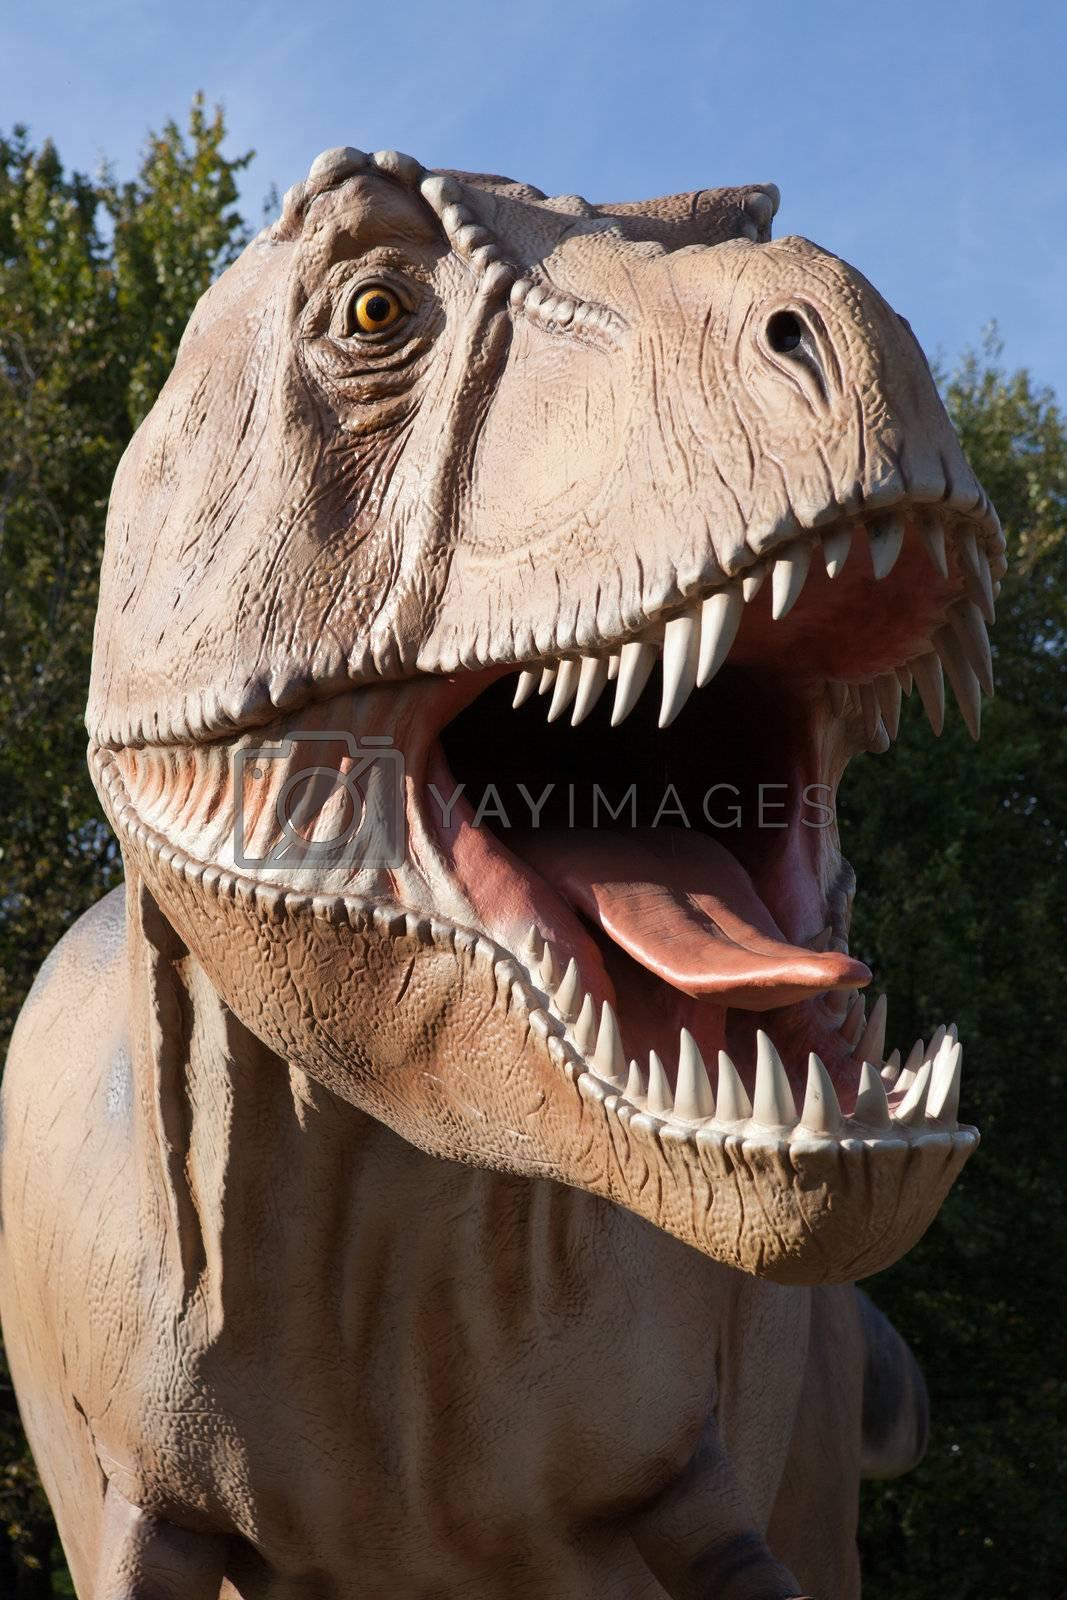 Reptile dinosaur tyrannosaurus rex on green tree and sky backgro by SergeyAK